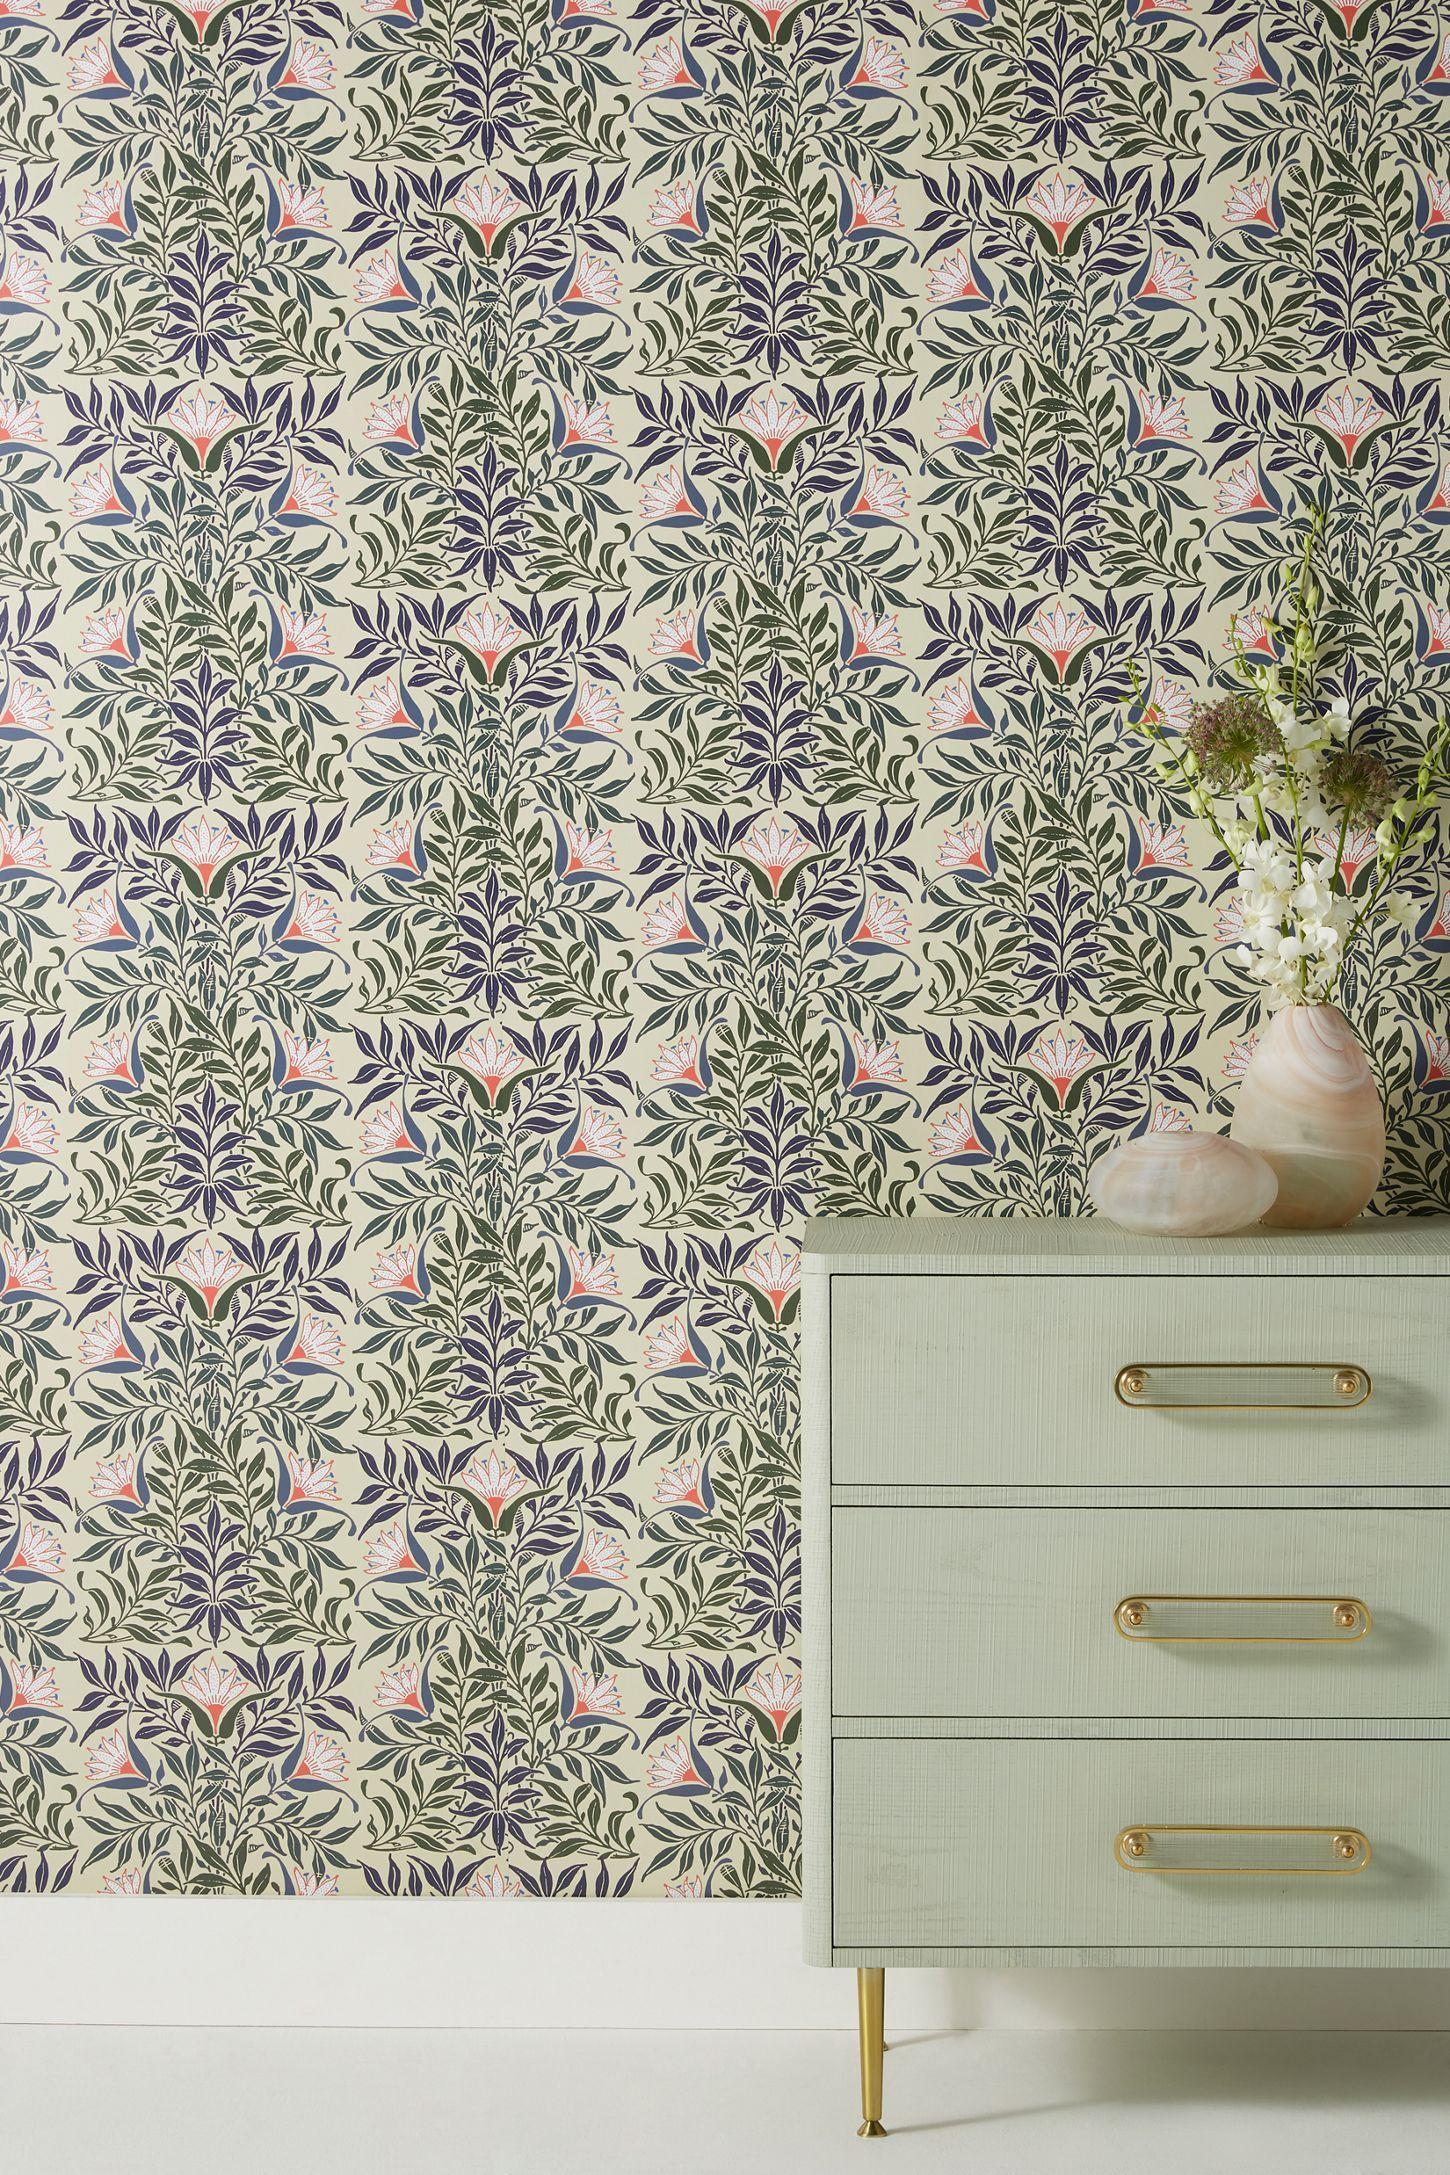 Flower Vine Wallpaper by Mitchell Black in Green, Wall